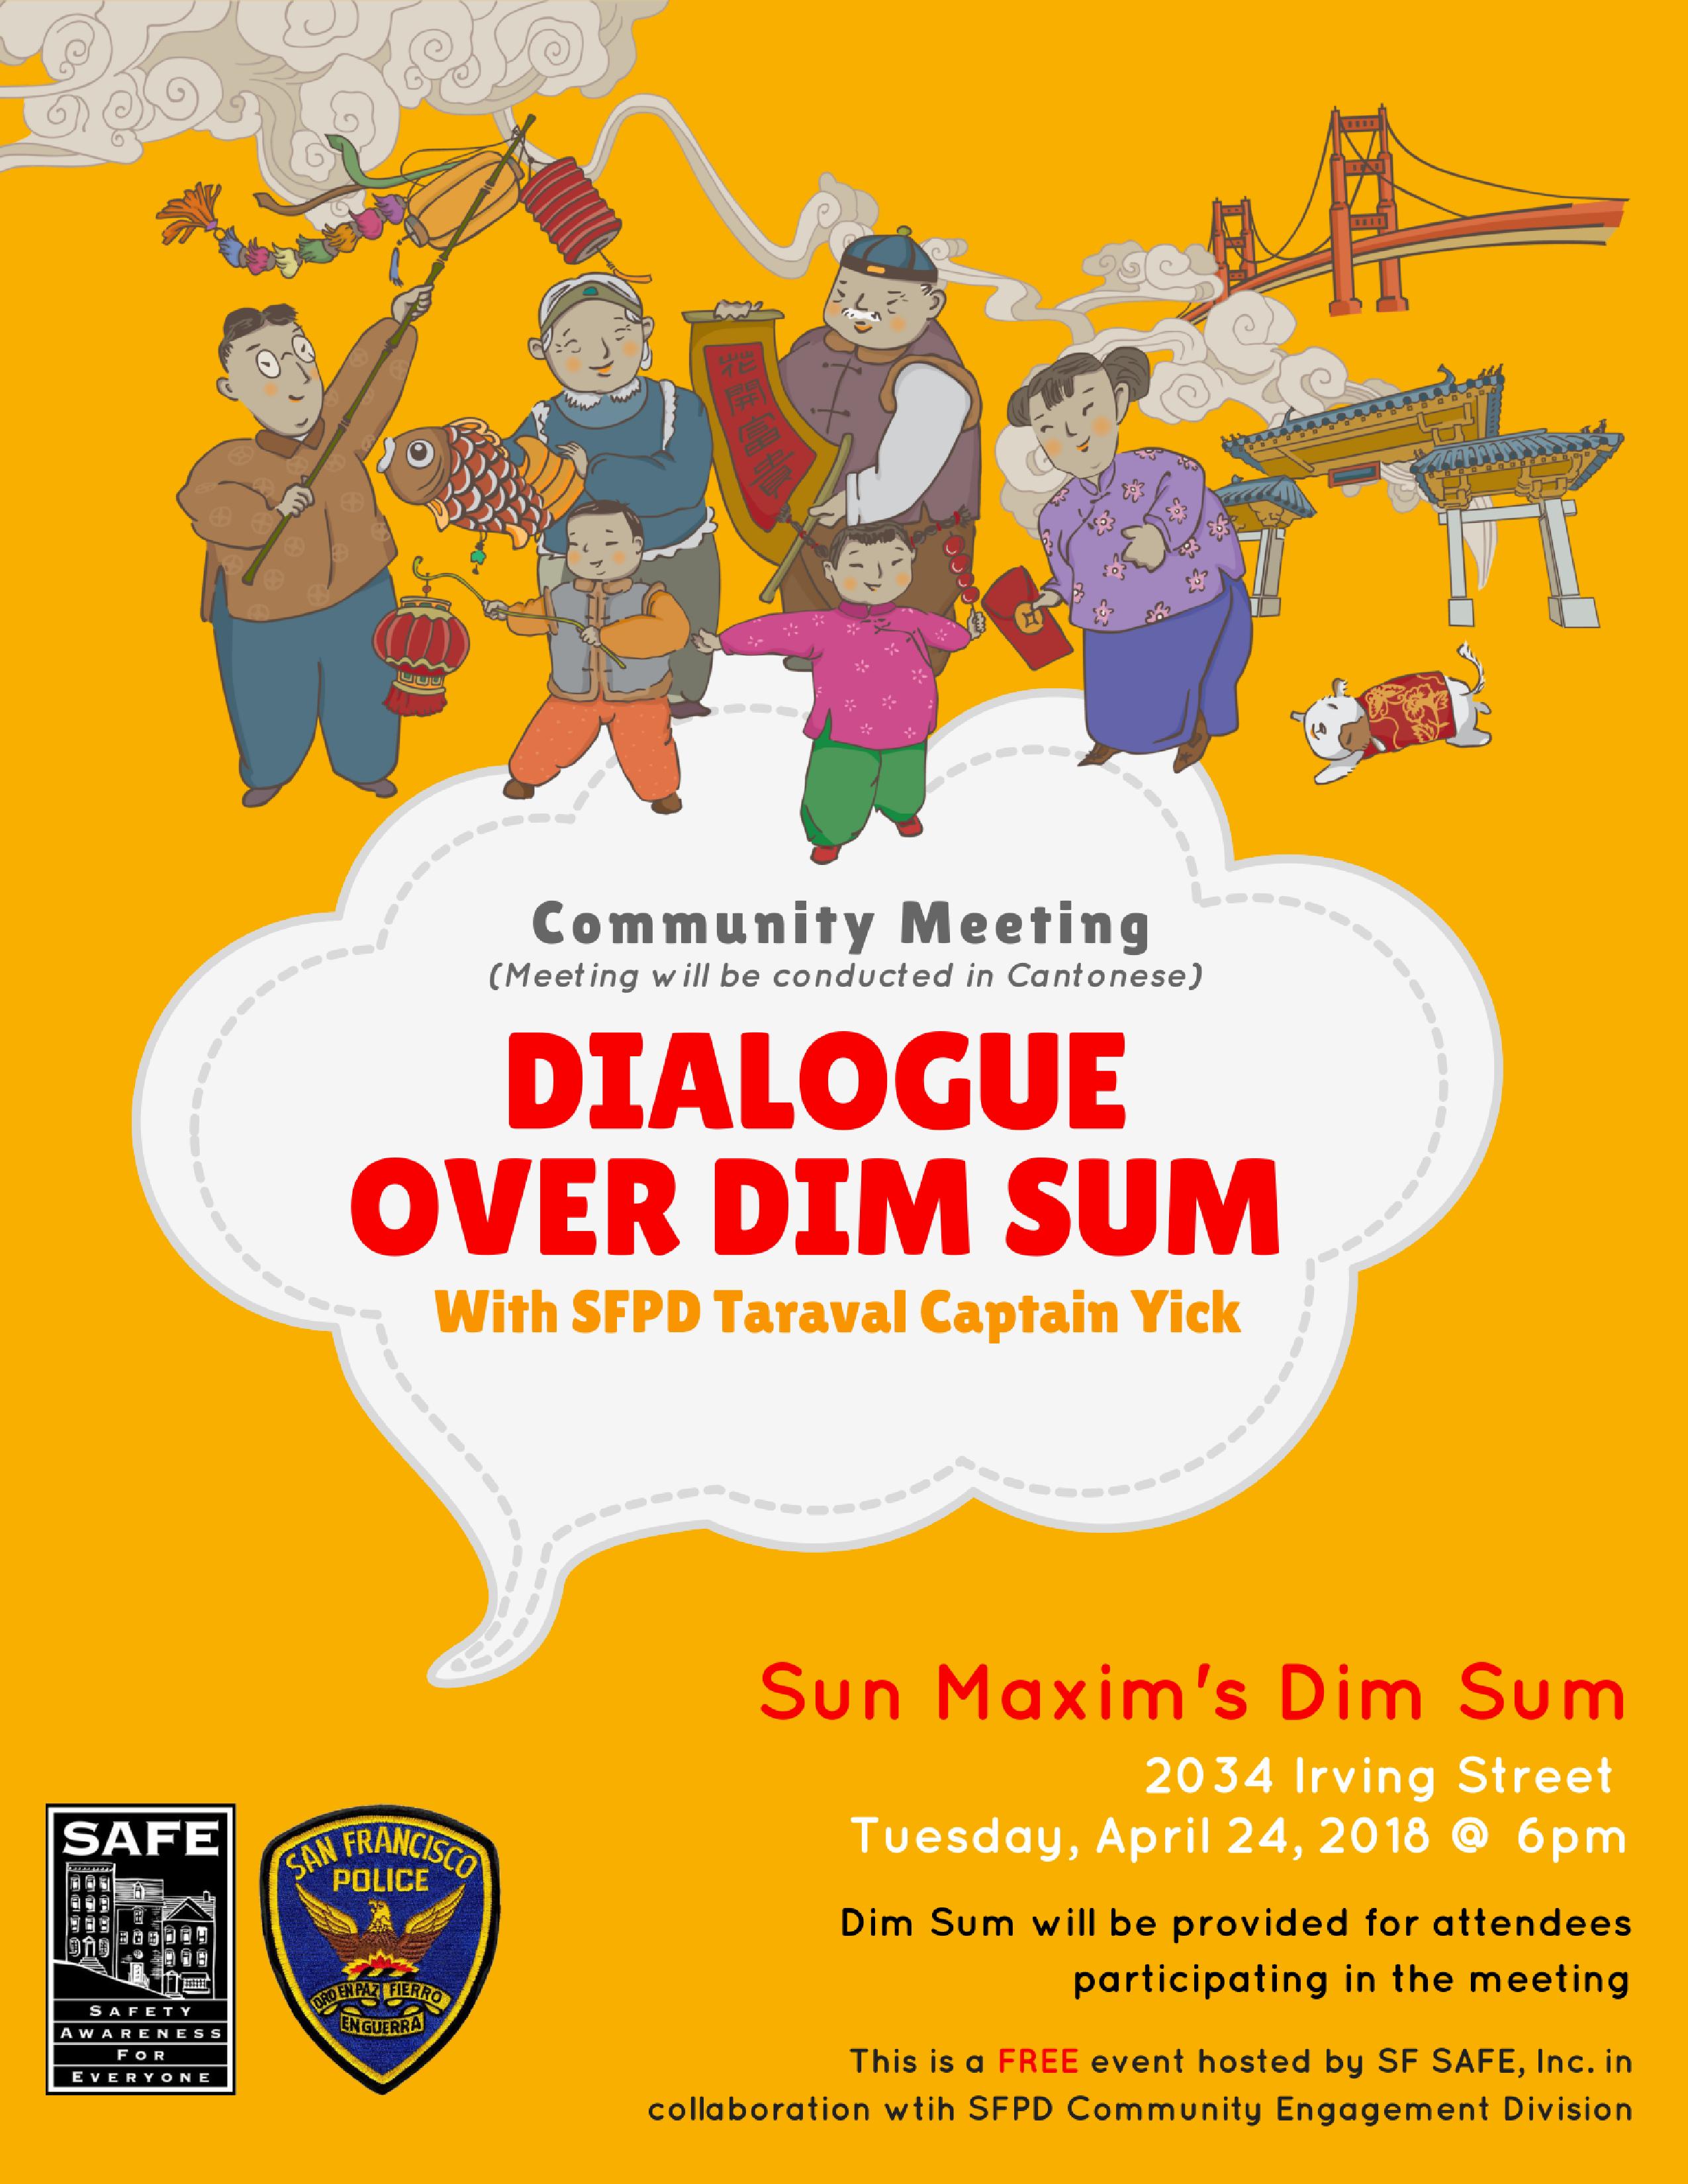 Dialogue Over Dim Sum flyer